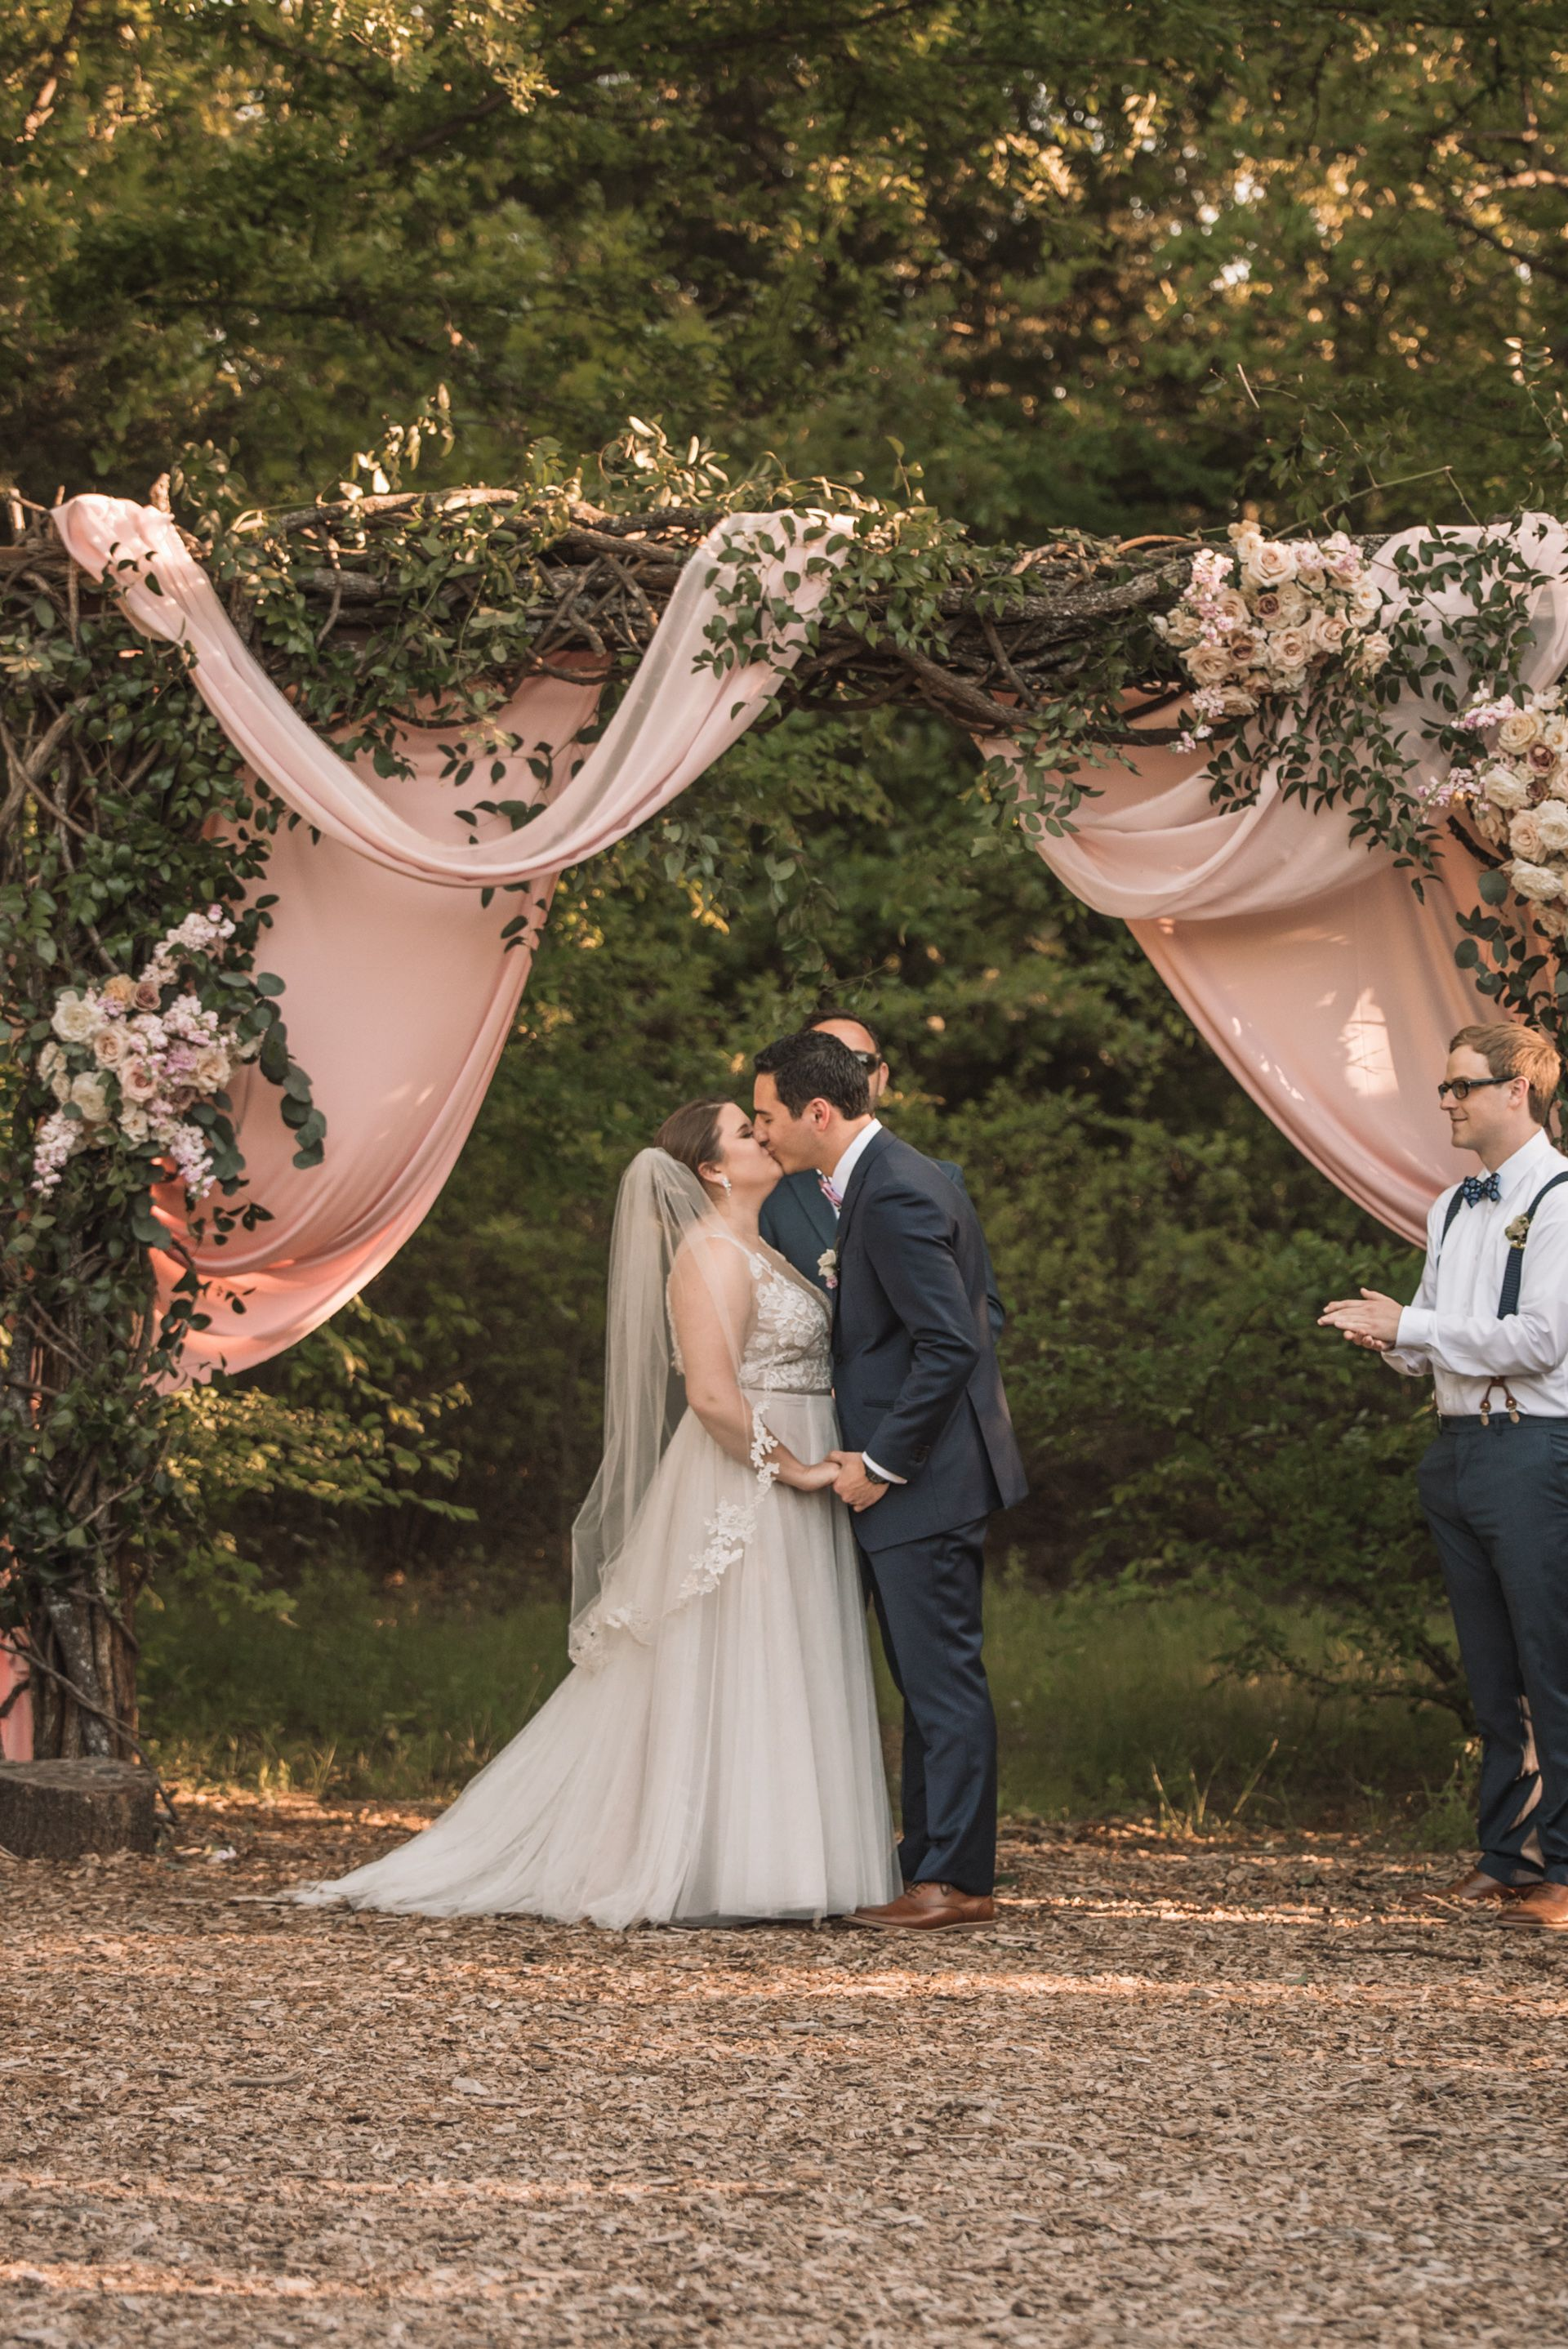 April wedding at The Grove in Aubrey, Texas! Miranda Marrs